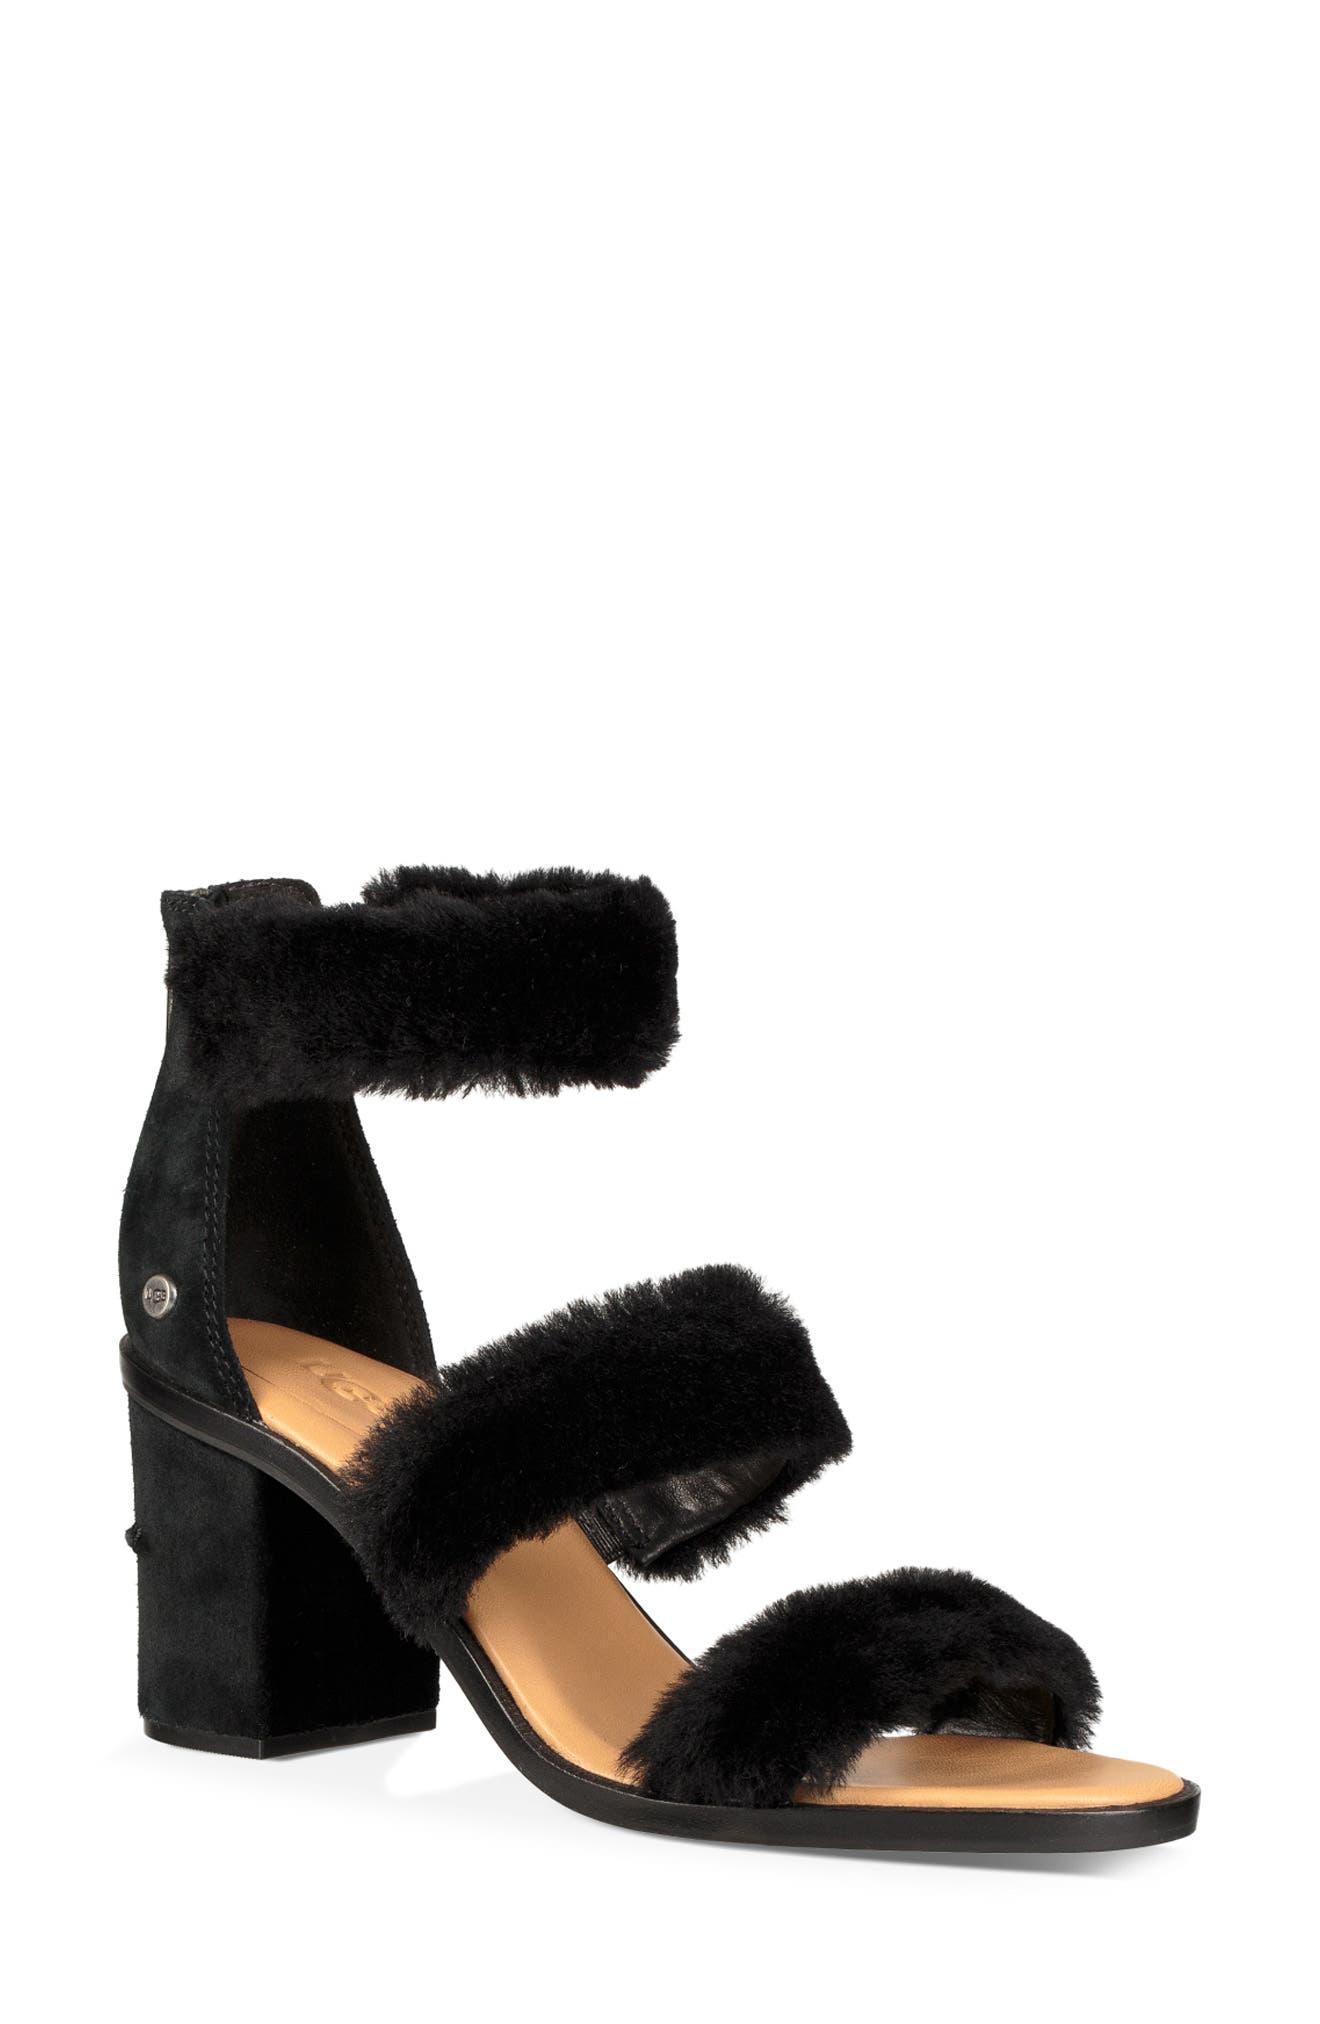 Dey Rey Genuine Shearling Sandal,                             Main thumbnail 1, color,                             001